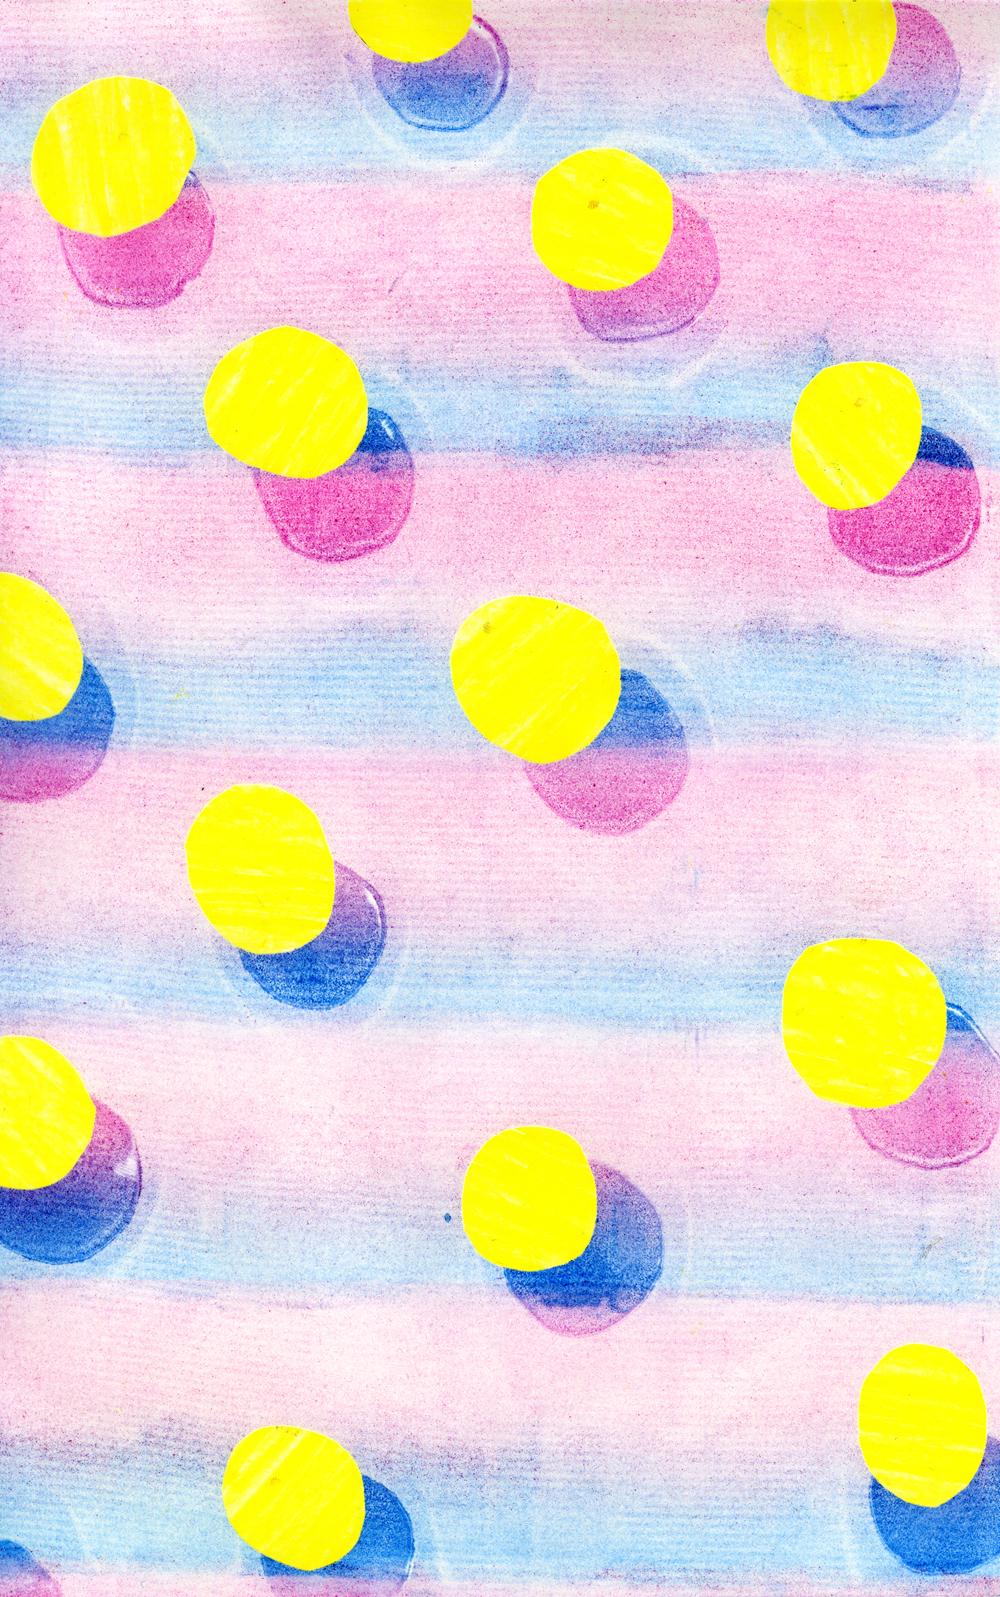 Untitled Yellow Dots